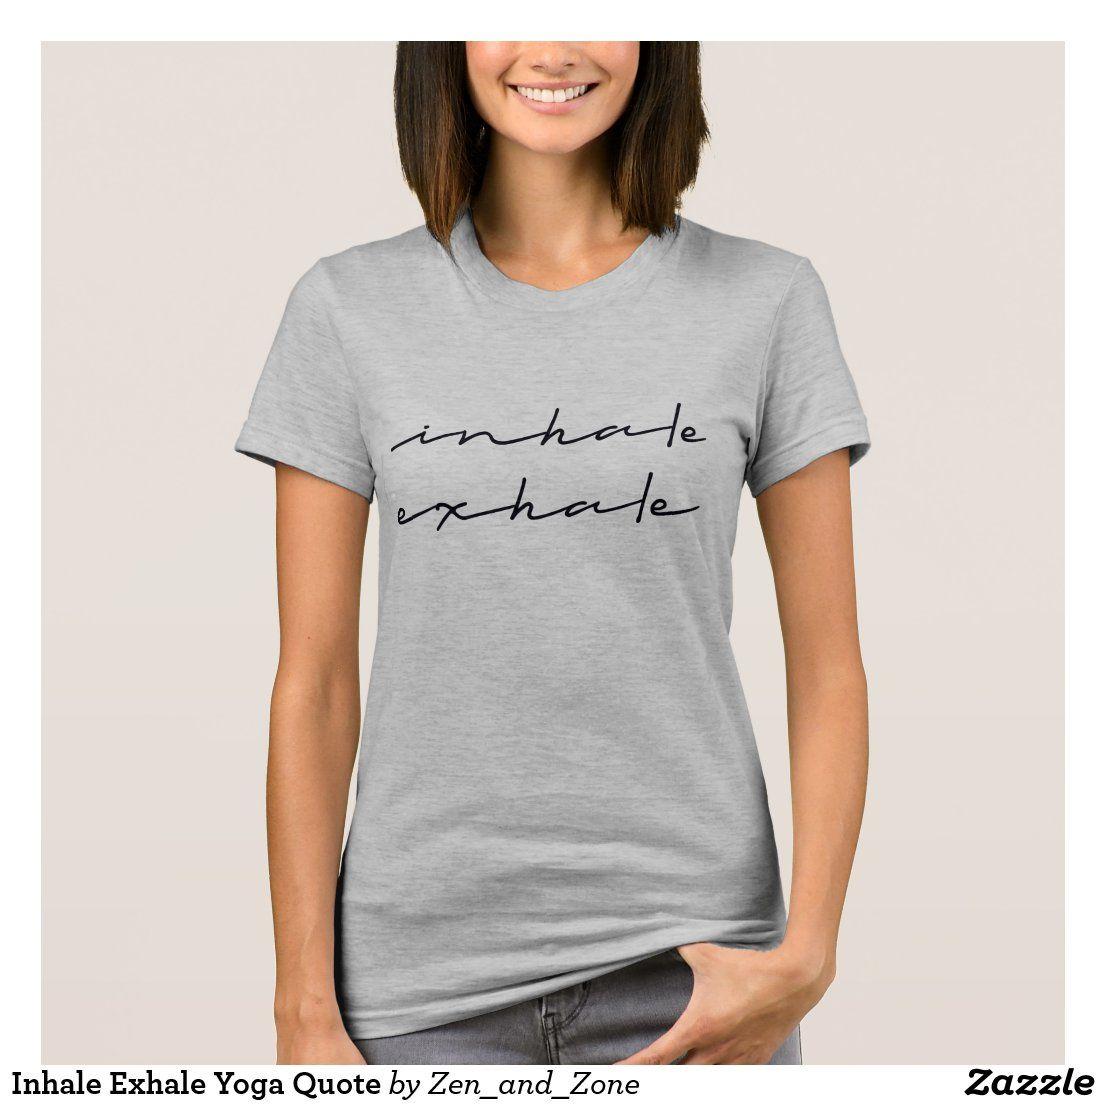 Inhale Exhale Yoga Quote T-Shirt | Zazzle.co.uk